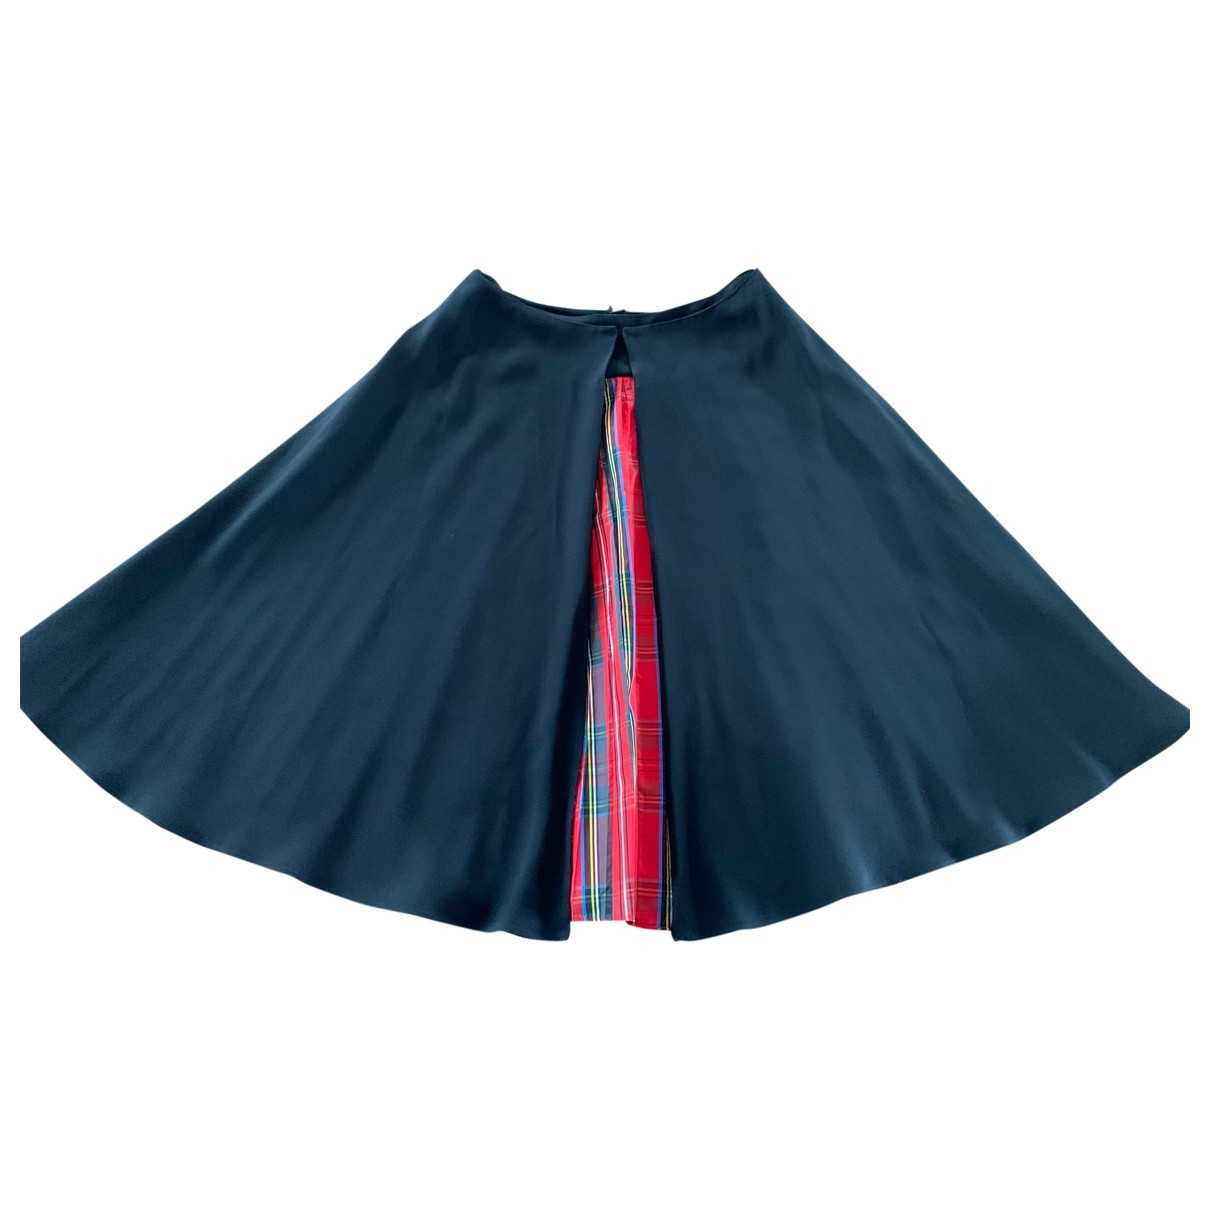 Moschino \N Black skirt for Women 42 IT